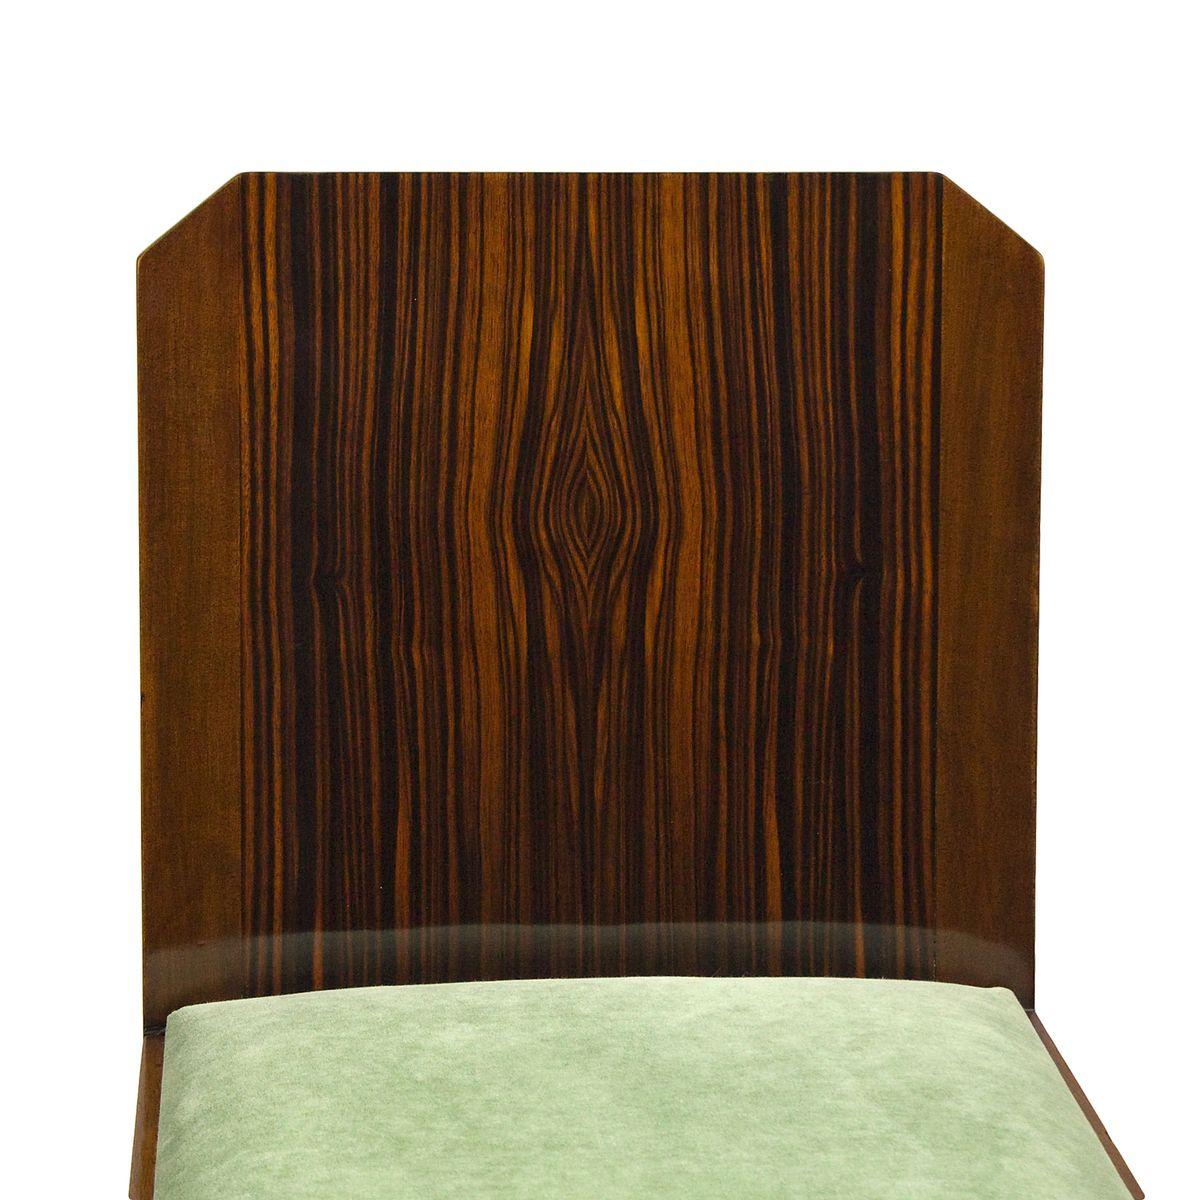 Vintage Art Deco Stühle 1930er 6er Set Bei Pamono Kaufen